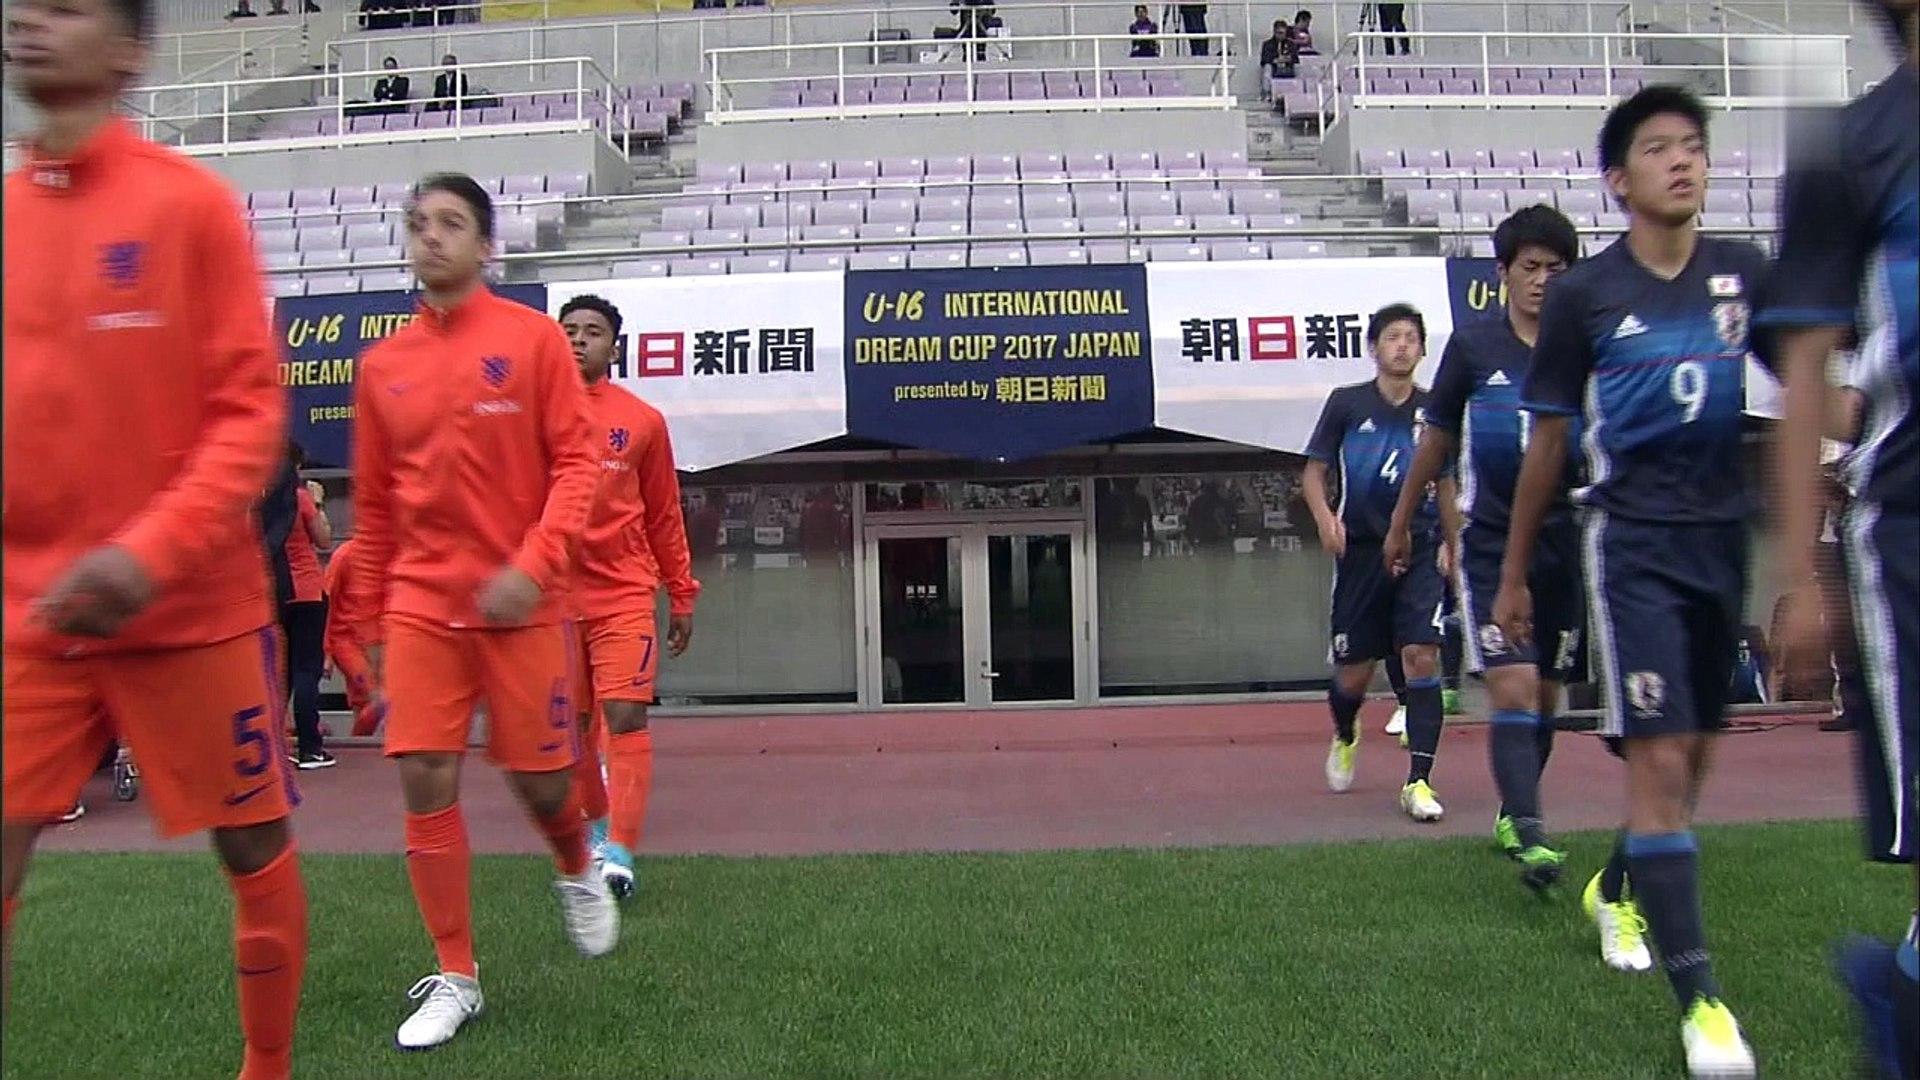 Japan×Netherland U16 International Dream Cup 2017/06/14